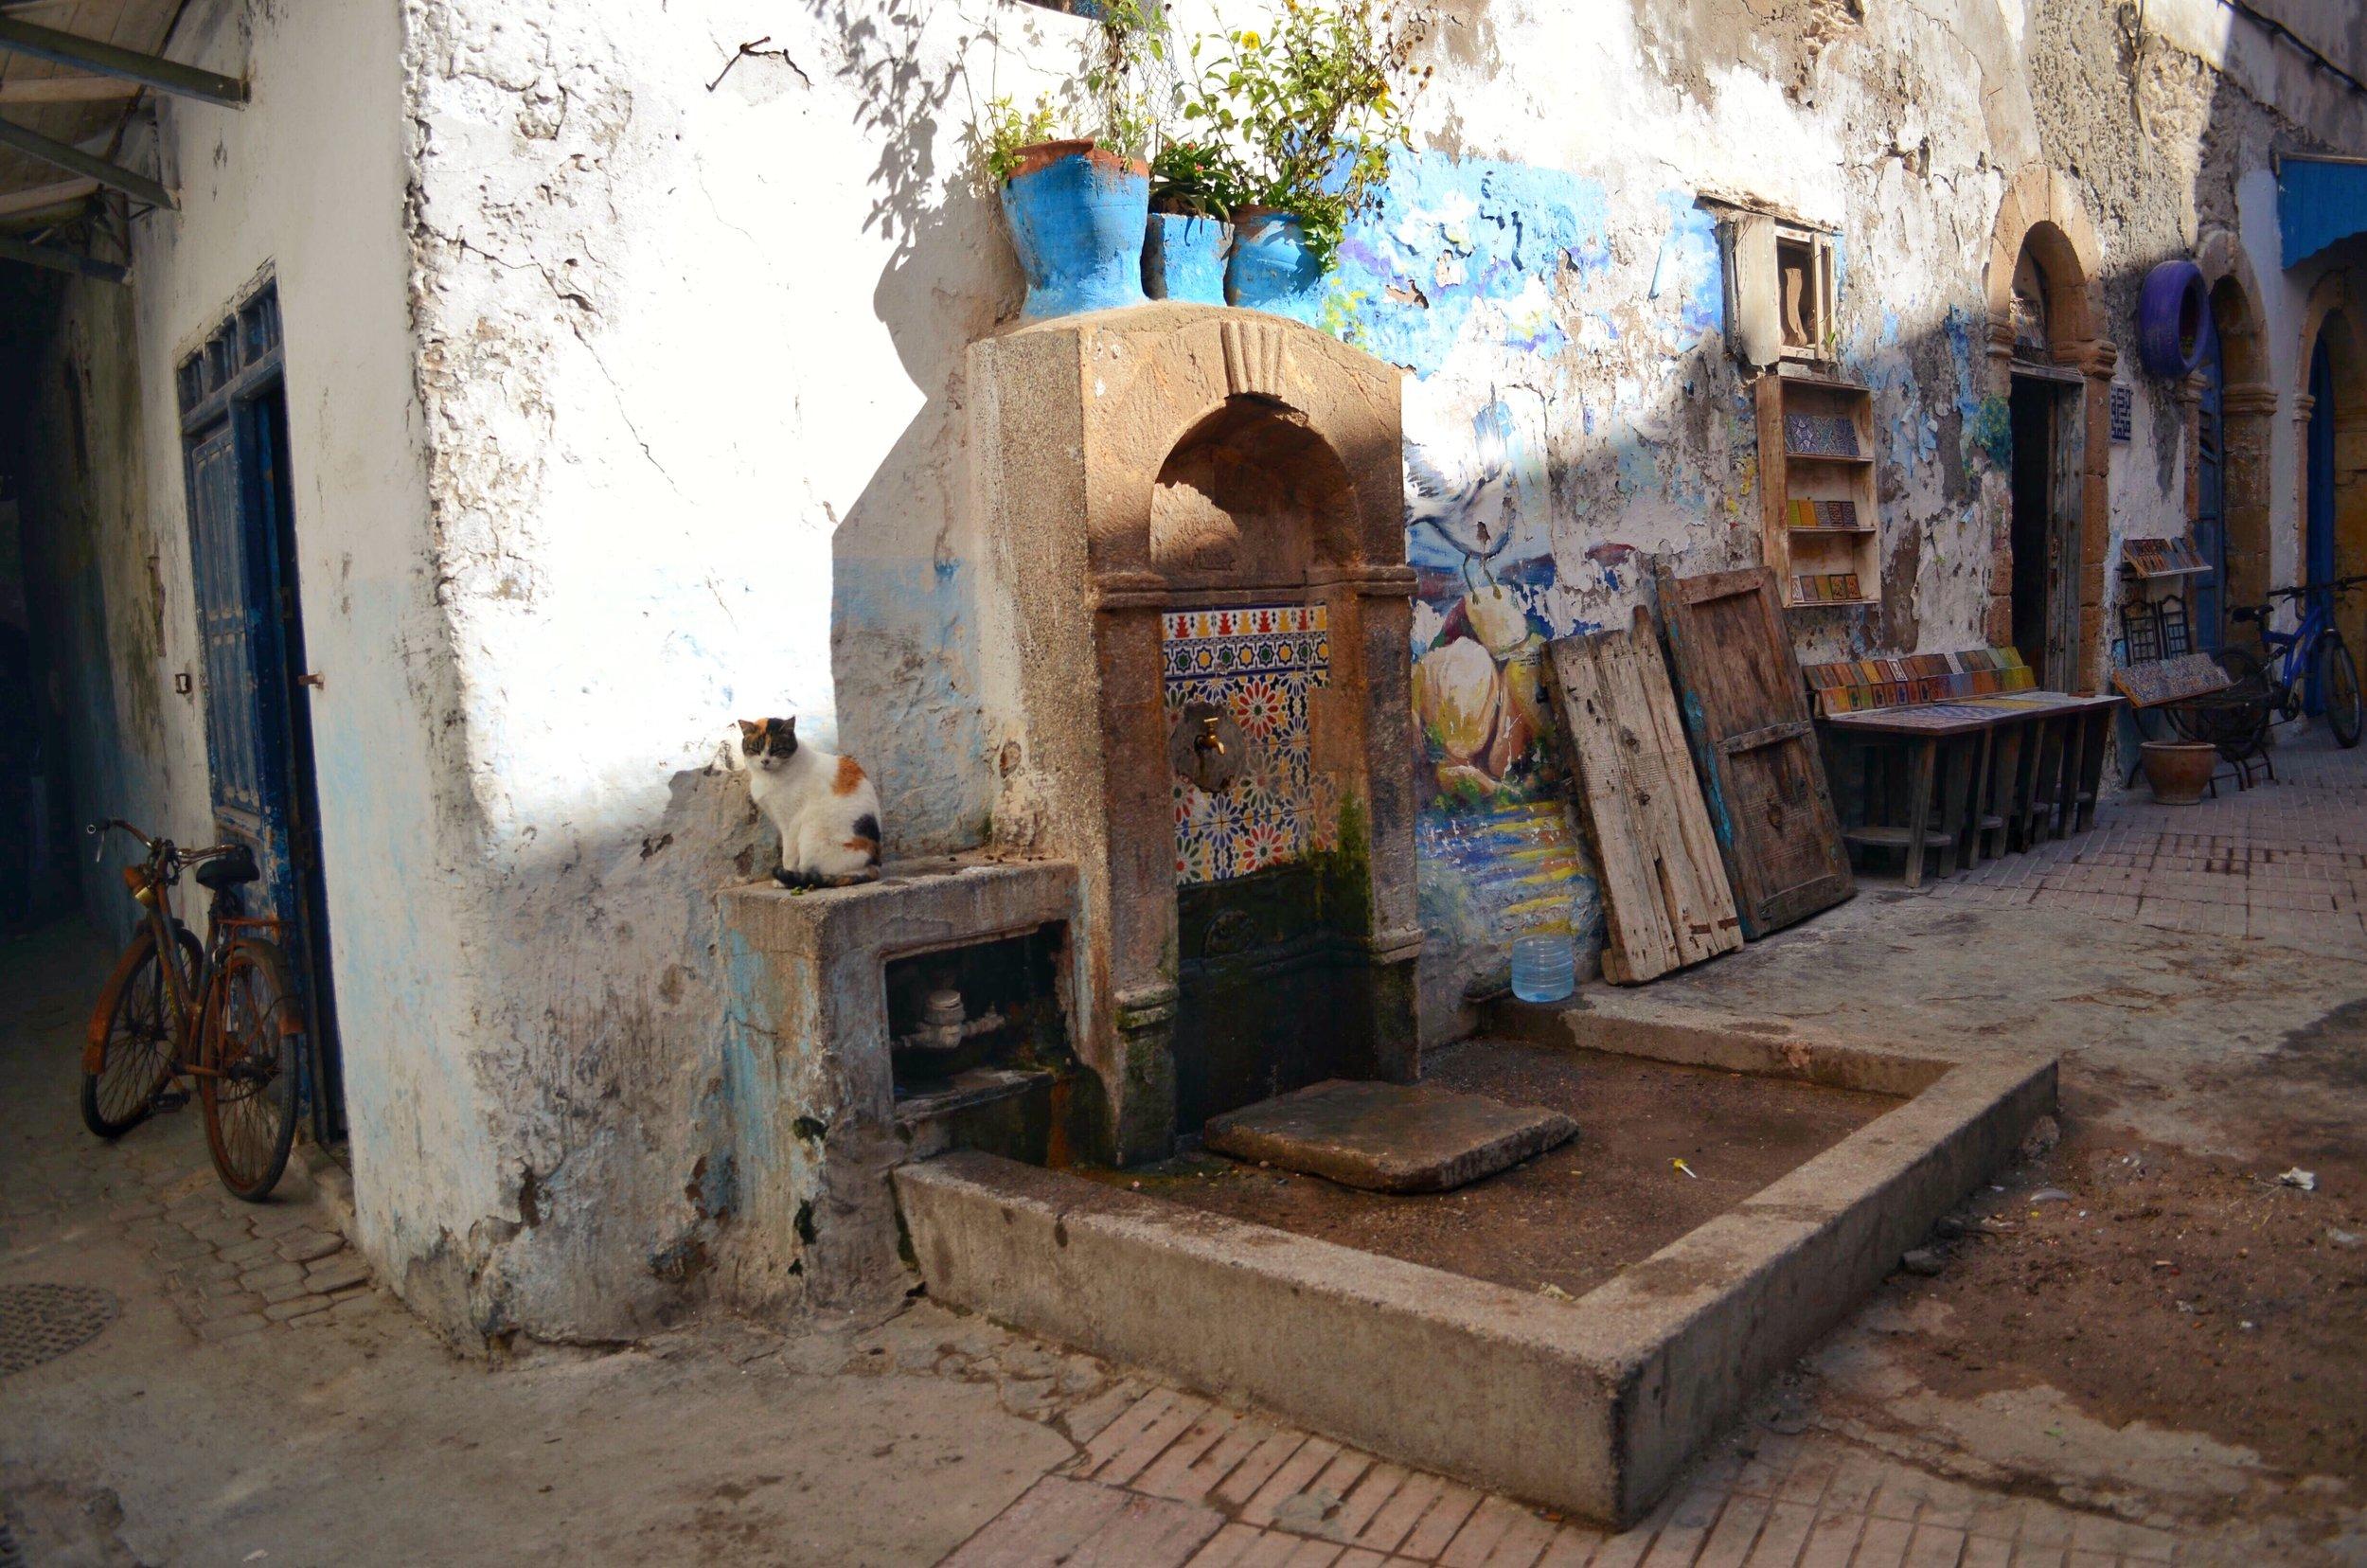 Morocco-Essaouira-Medina